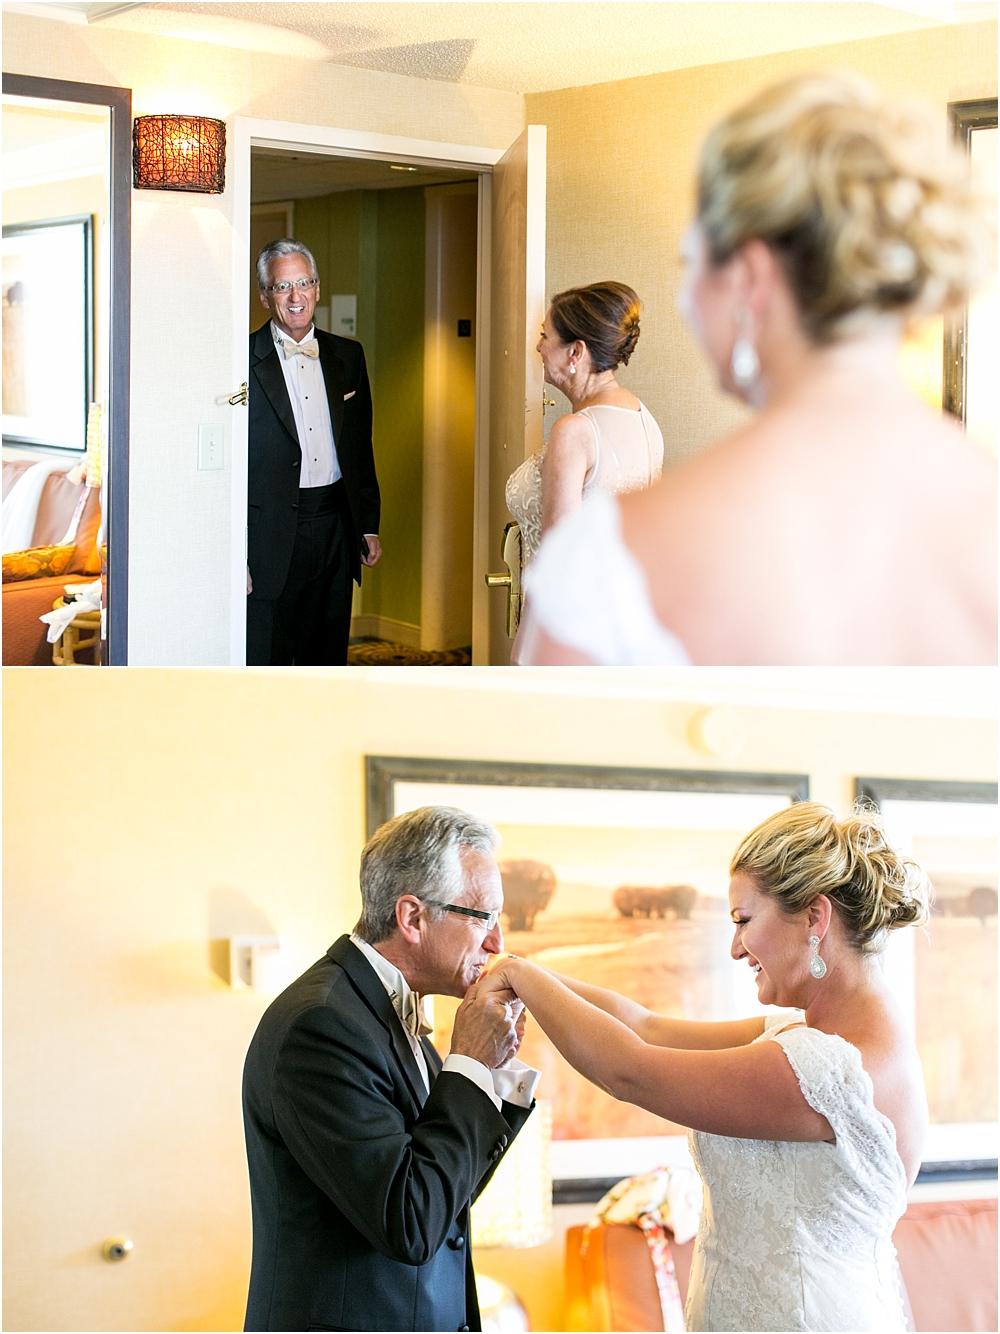 hidalgo wedding tabrizis waterfront weddings living radiant photography photos_0007.jpg